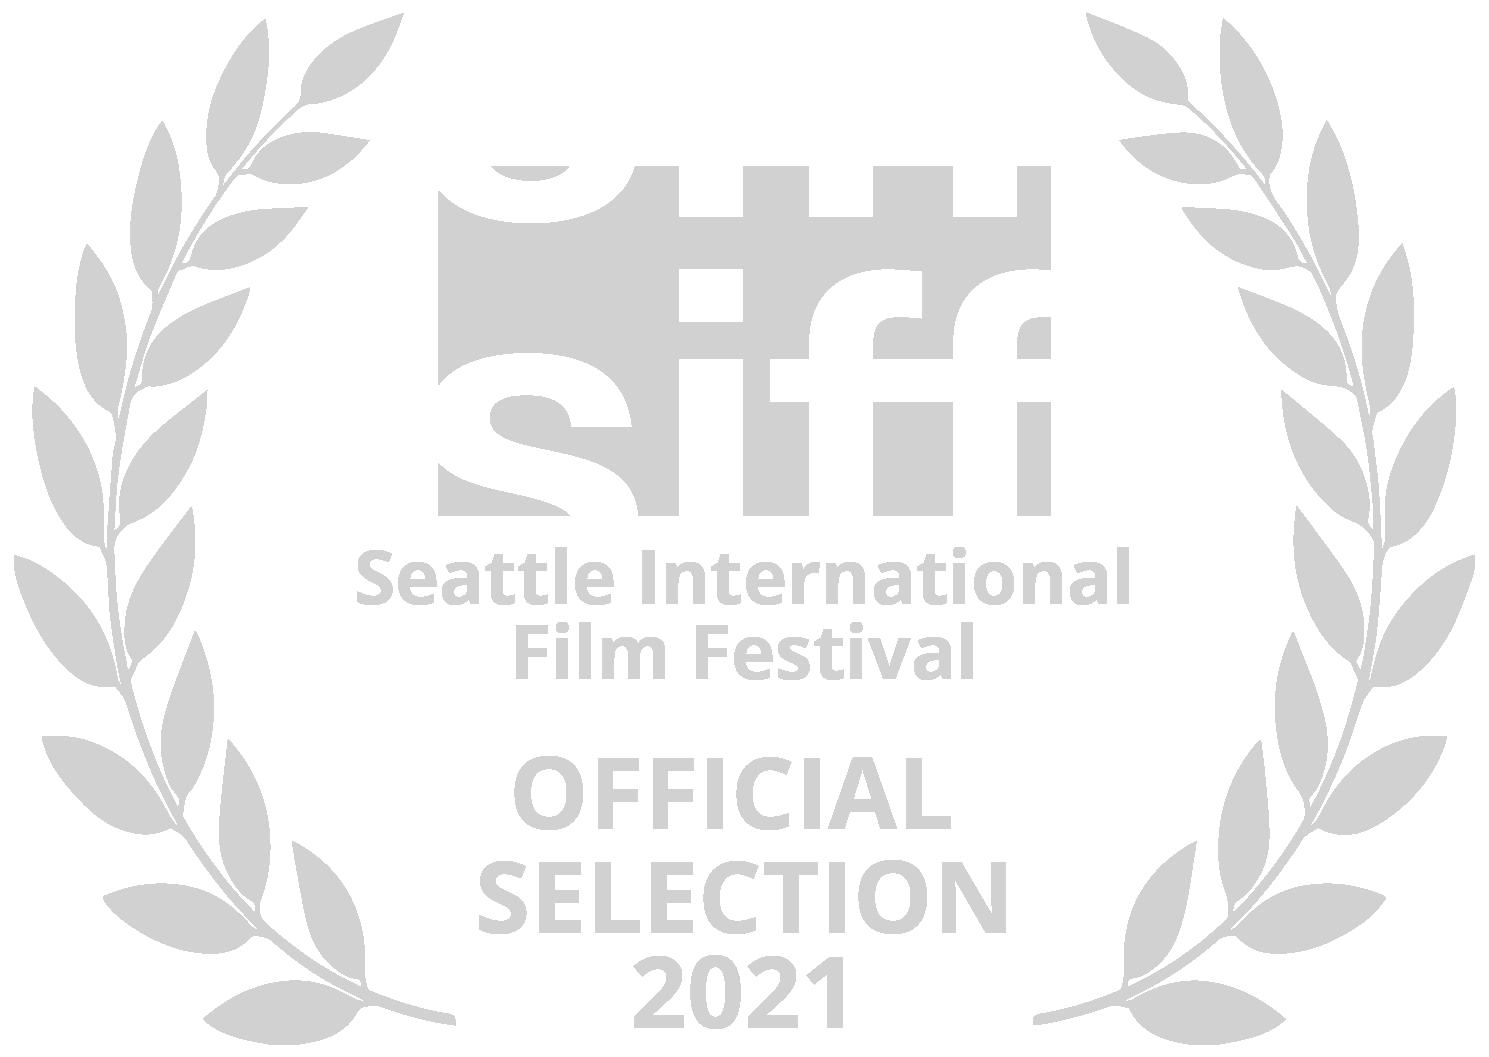 Seattle International Film Festival Official Selection 2021